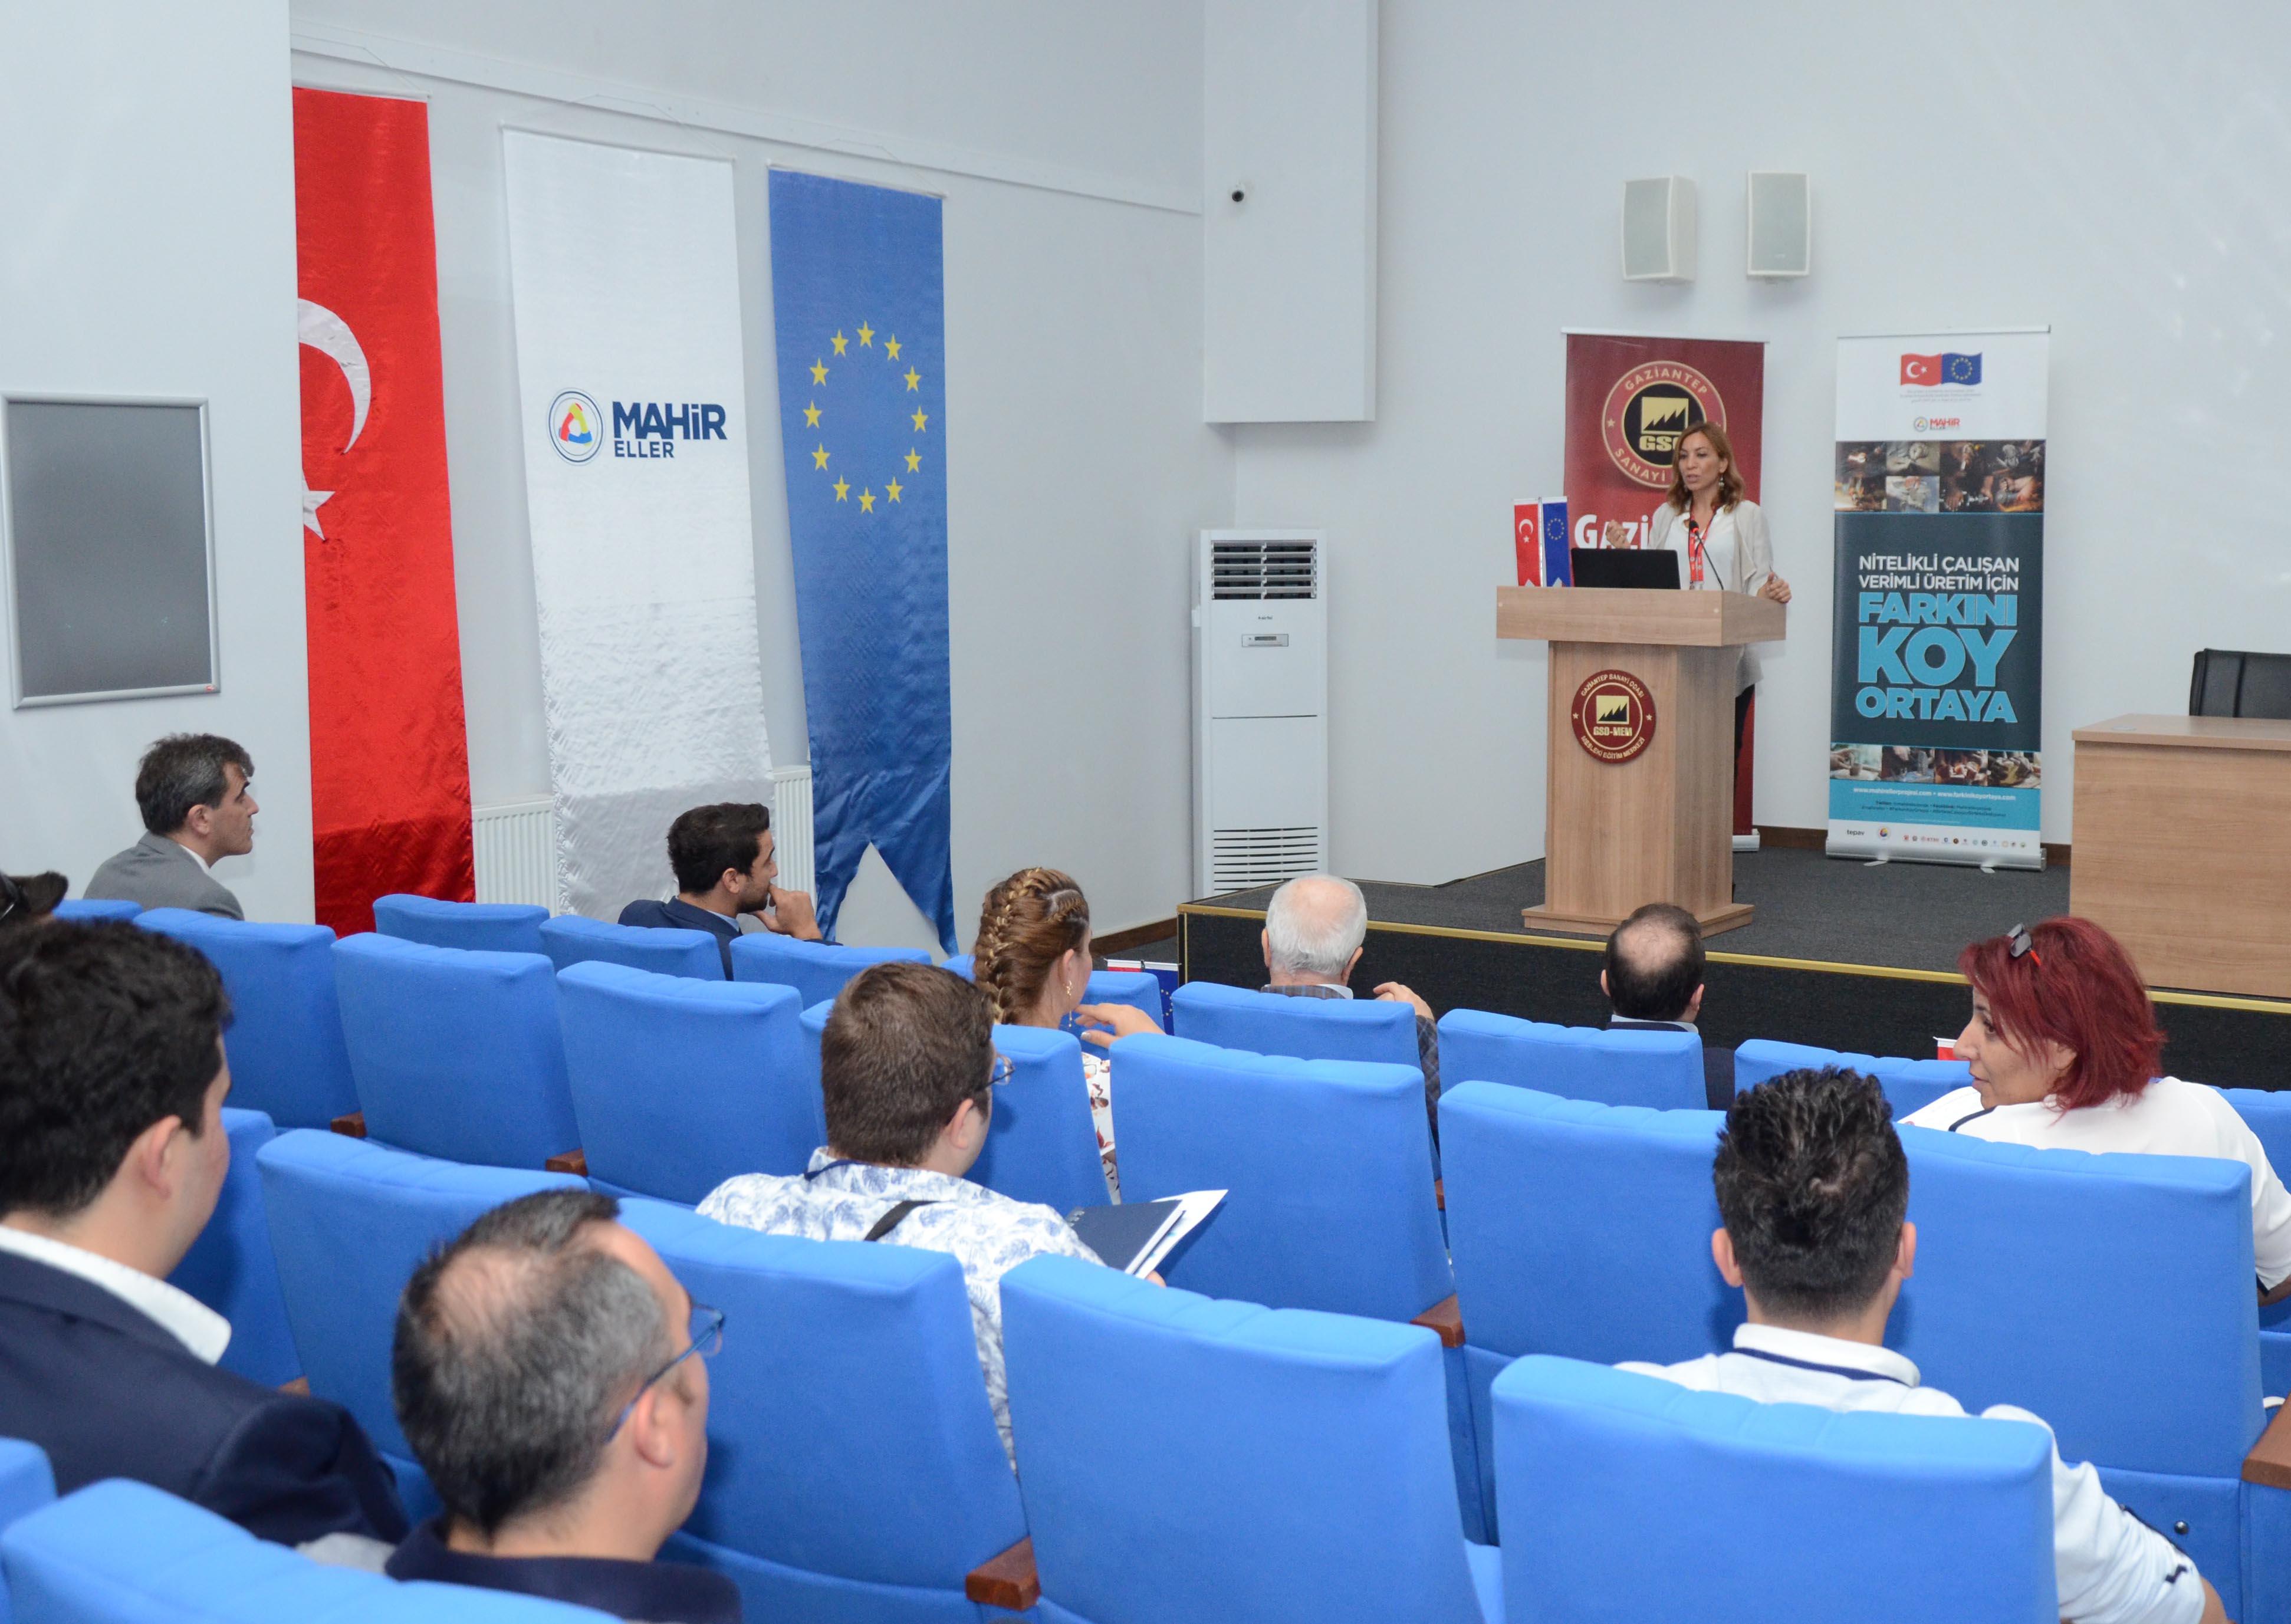 6 Ağustos 2019-Gaziantep